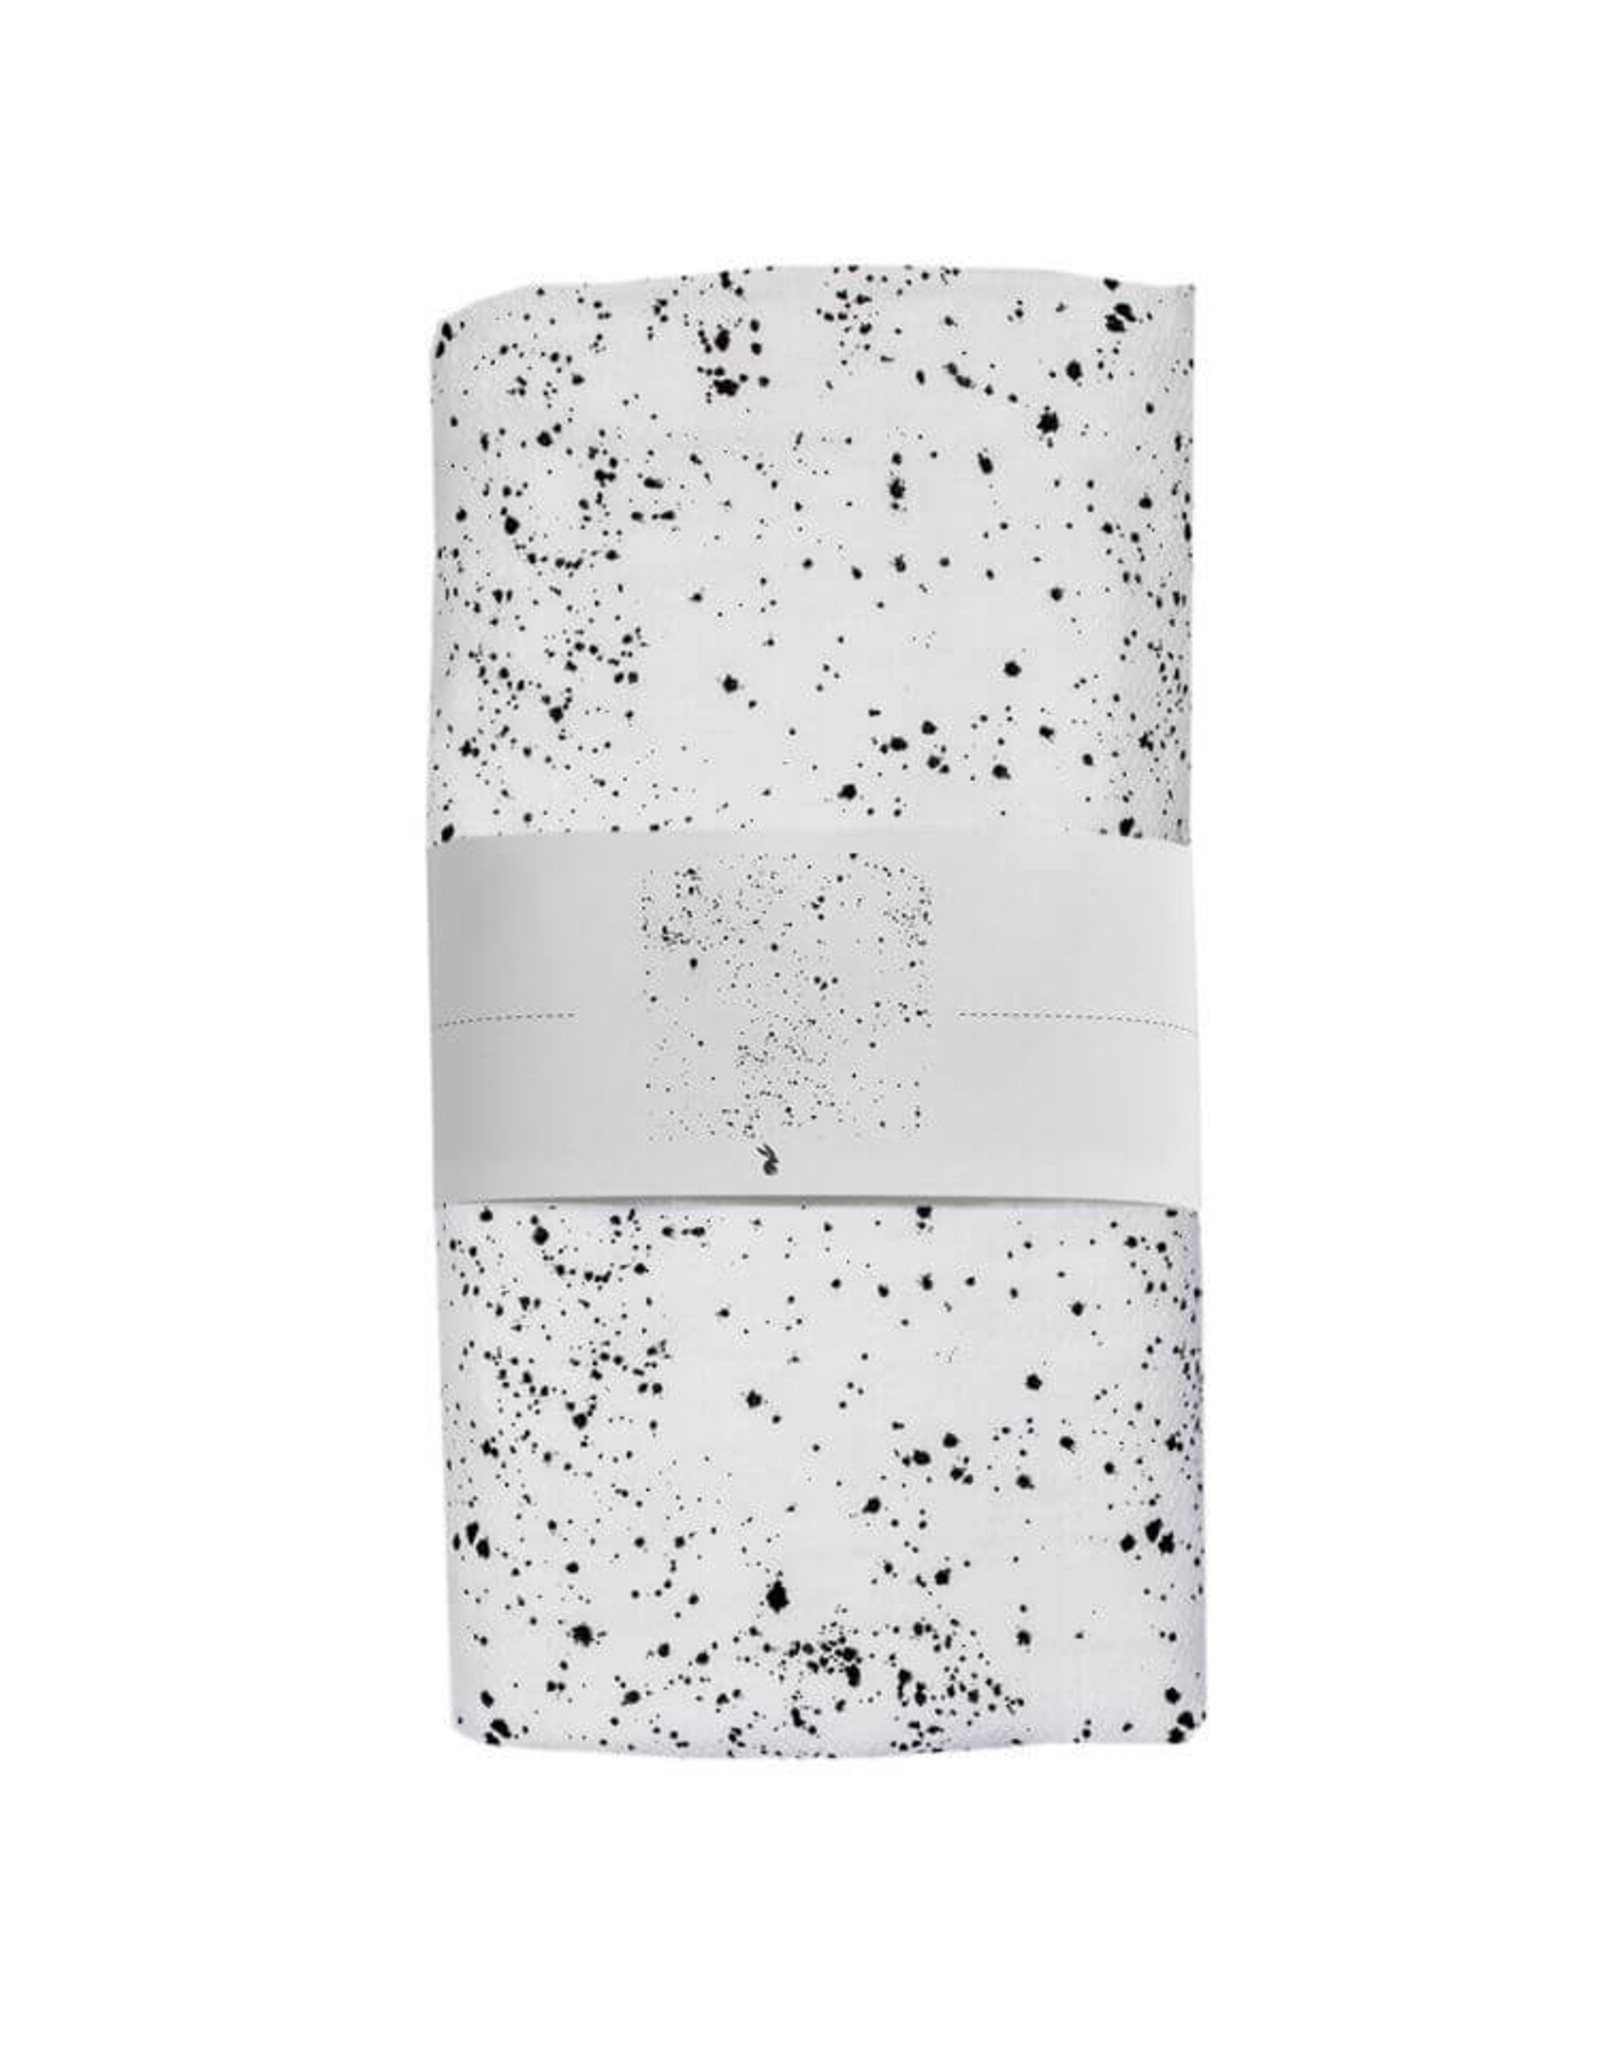 MIES&CO Mies&co - Swaddle Galaxy - White